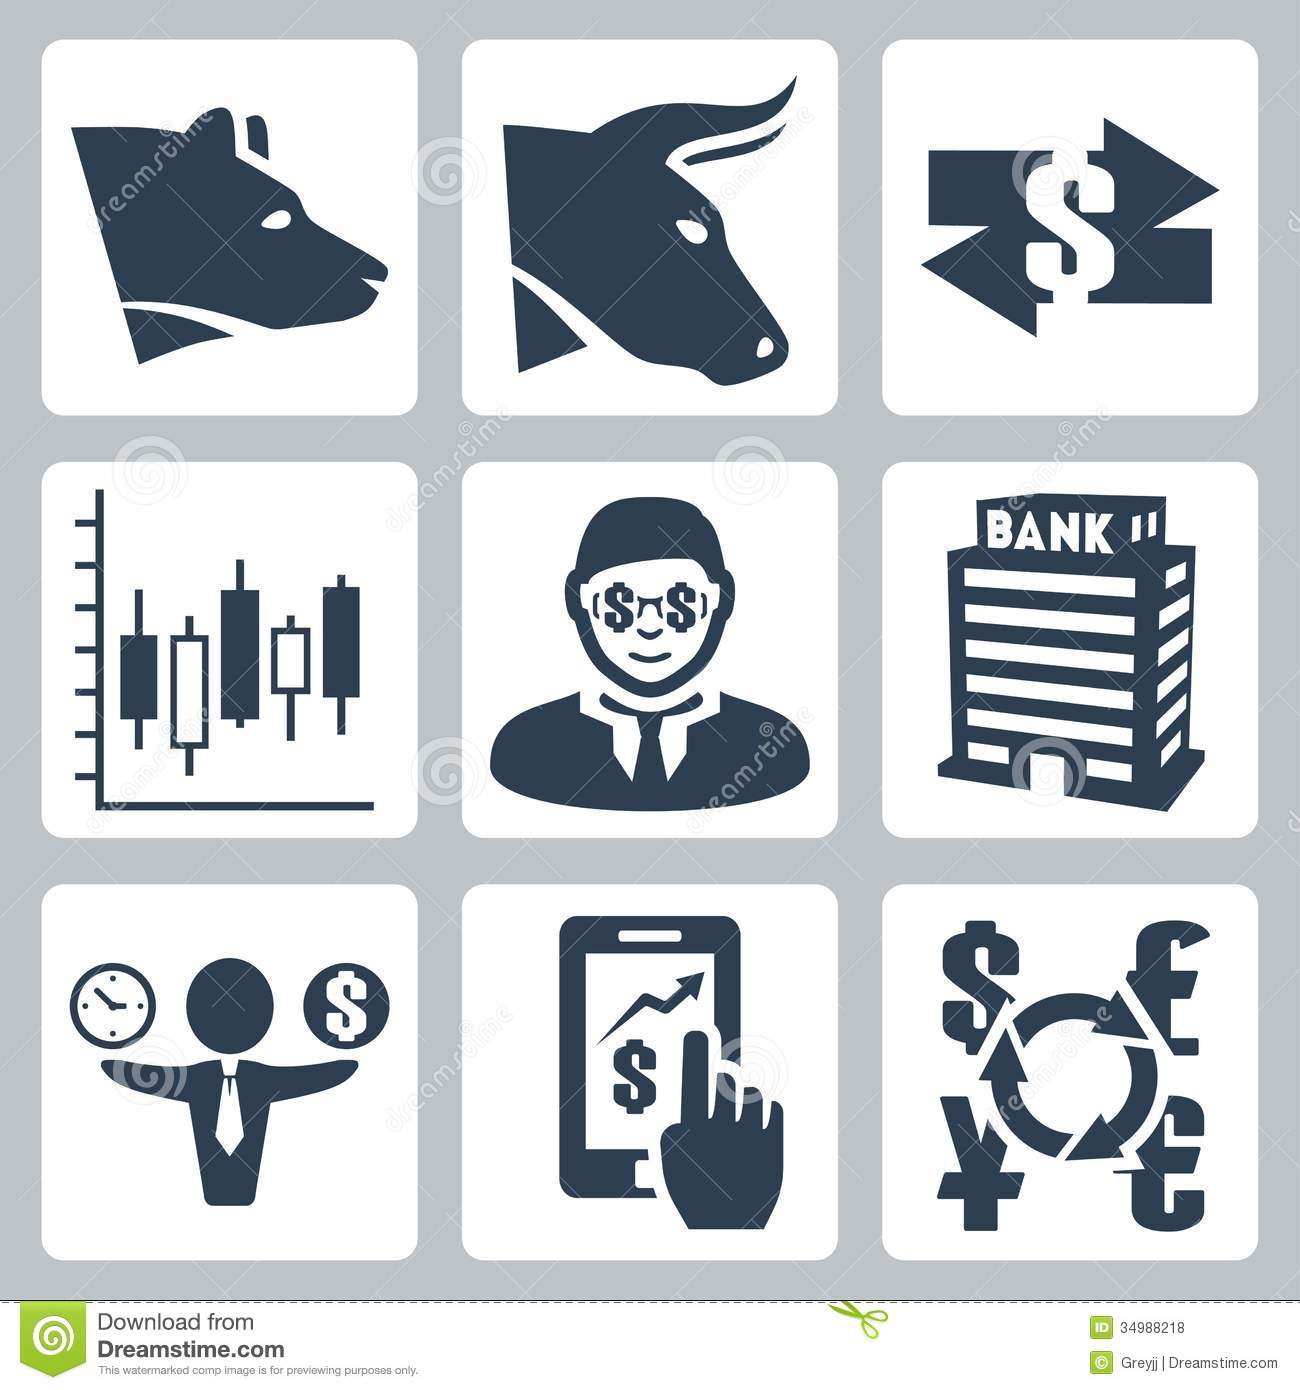 14 Stock Exchange Icon Images